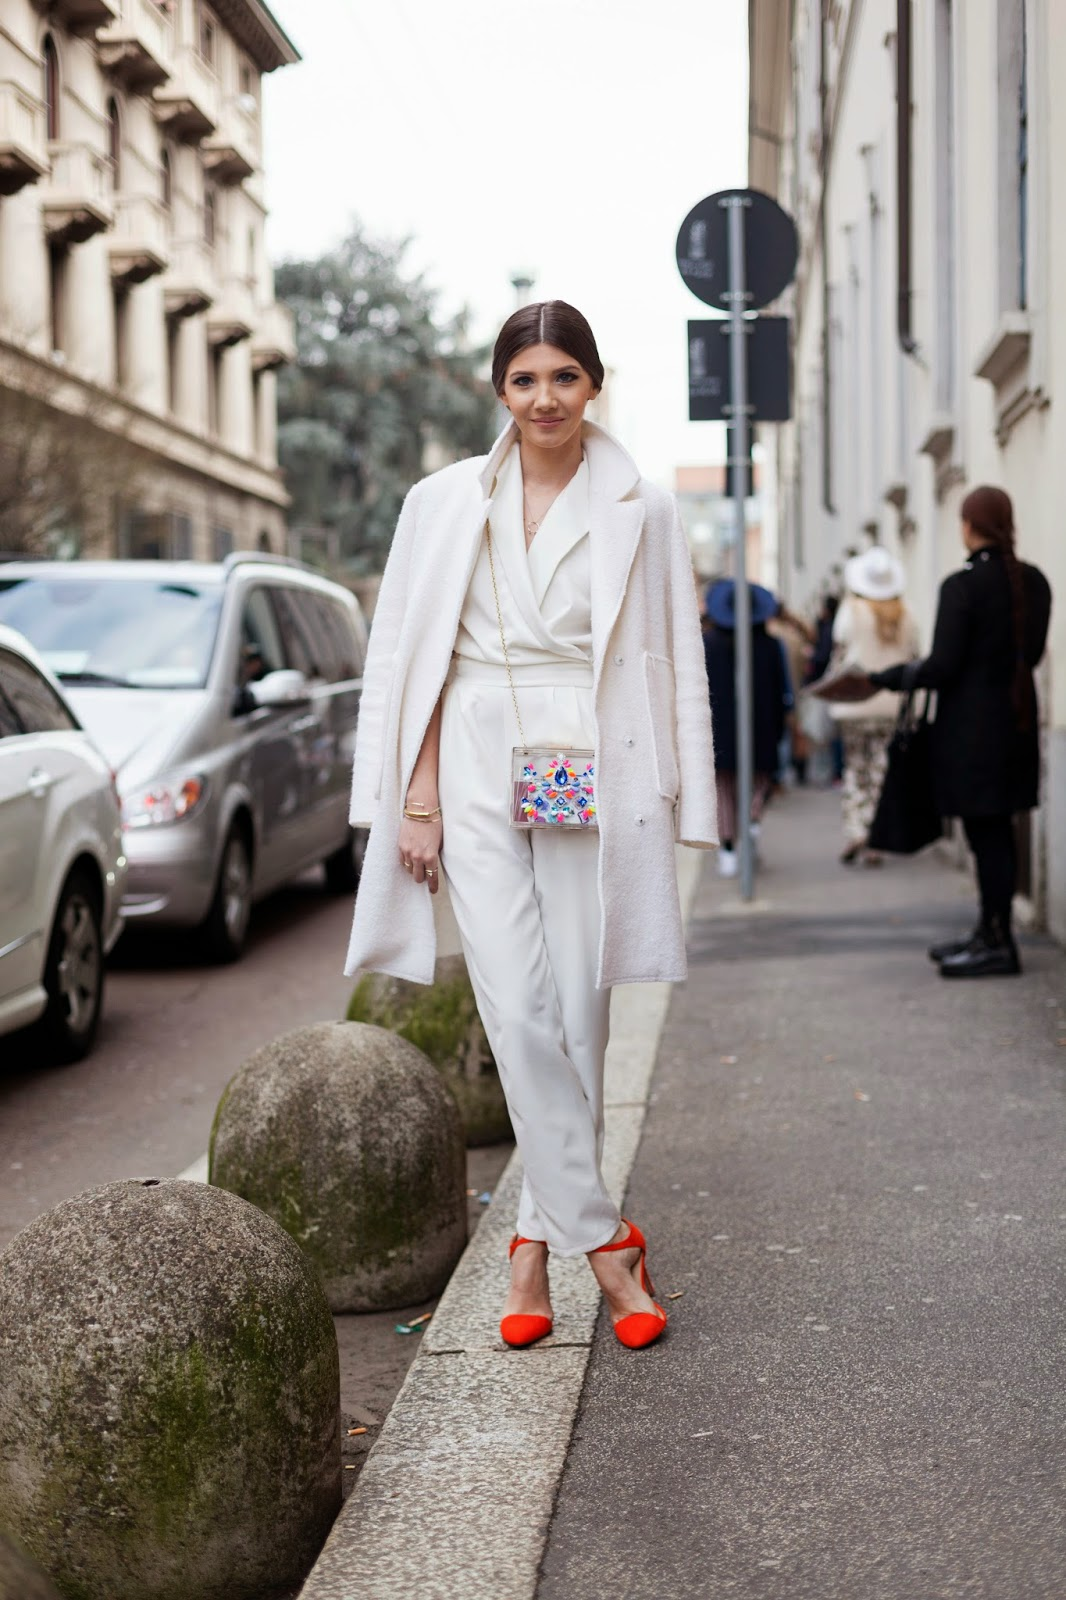 Milan Fashion Week f/w 15-16 street style - day 2